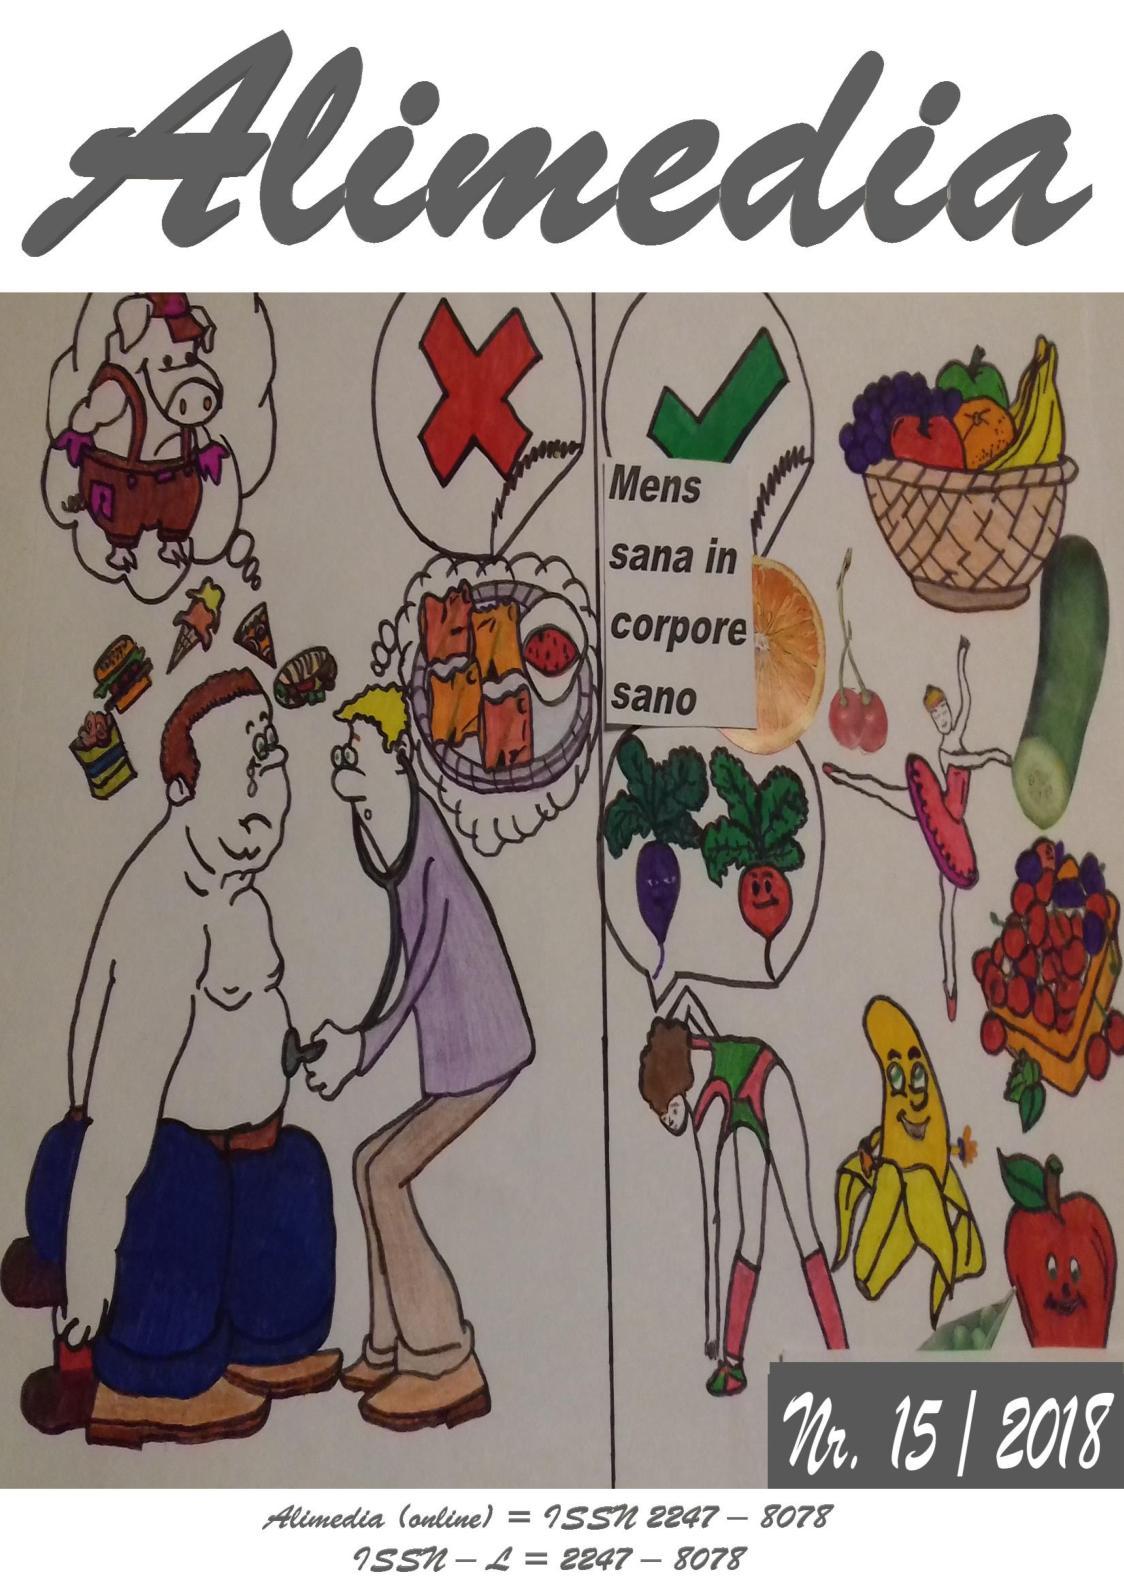 pierdere în greutate robert costa pbs)